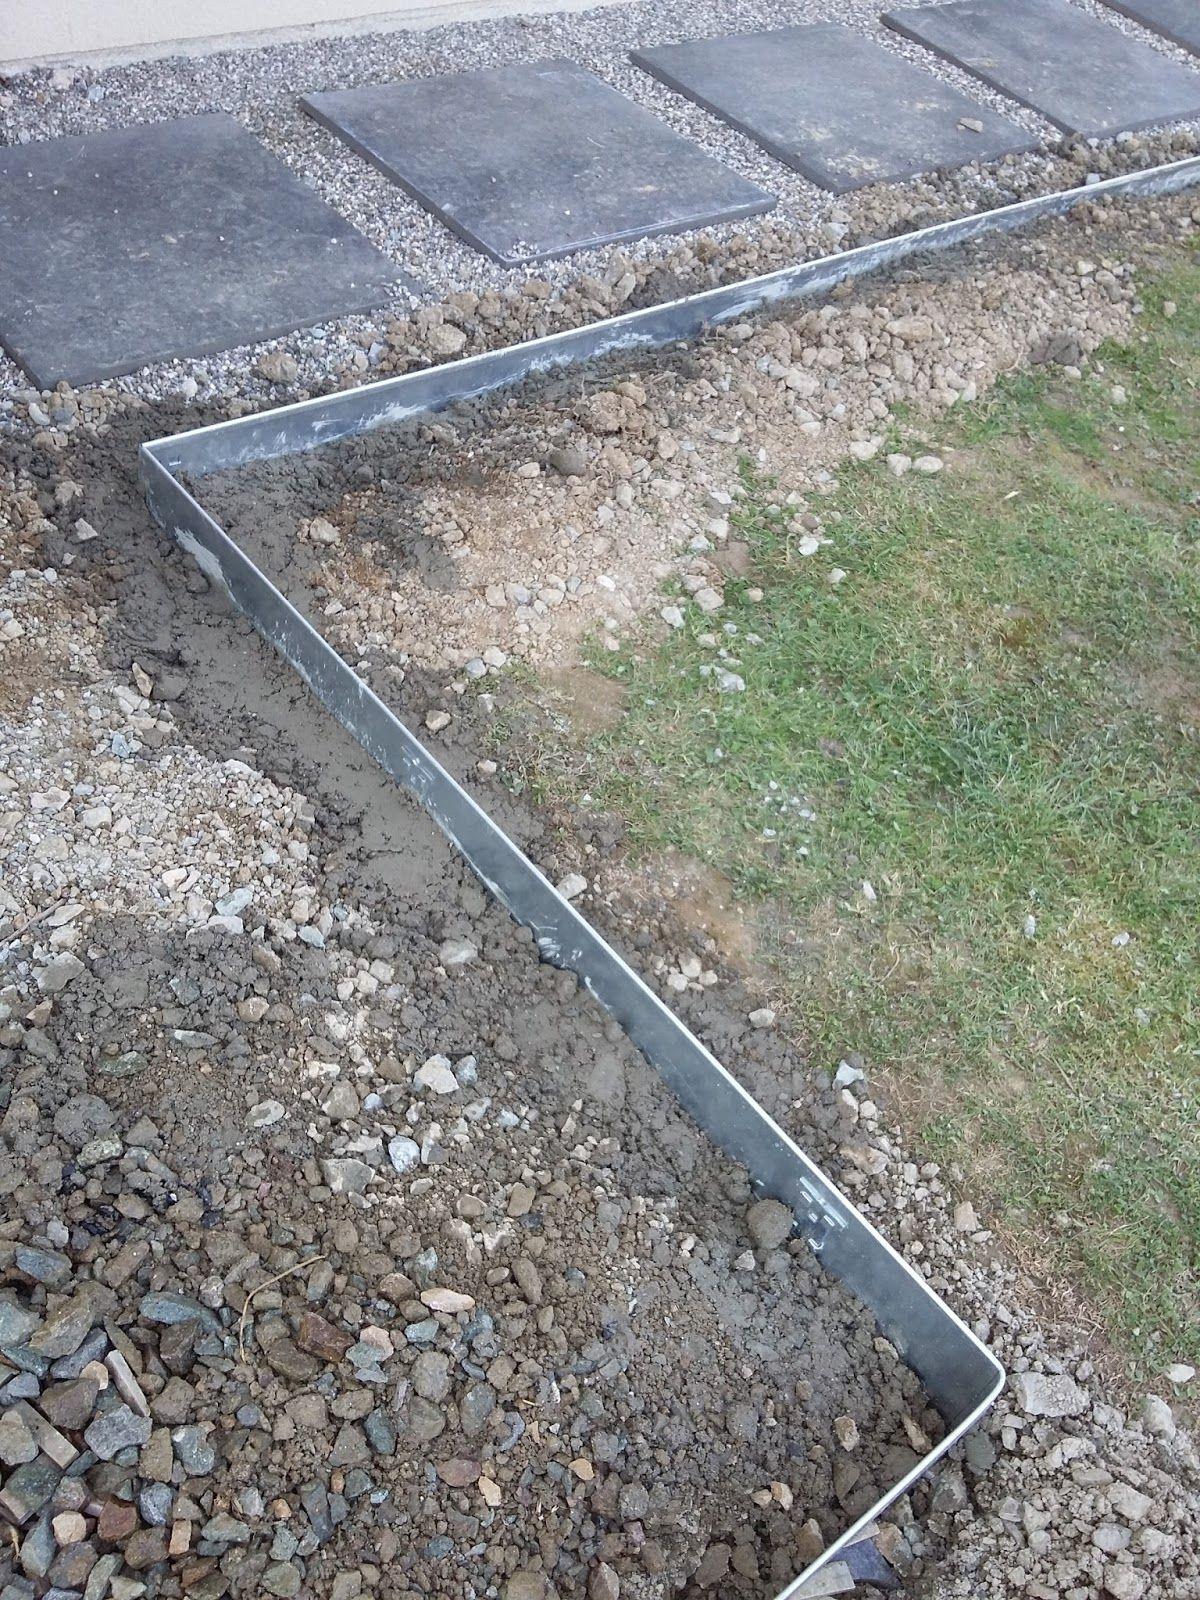 Bordure De Jardin Beton - 28 Images - Pose De Bordures B 233 ... encequiconcerne Bordures De Jardin En Beton